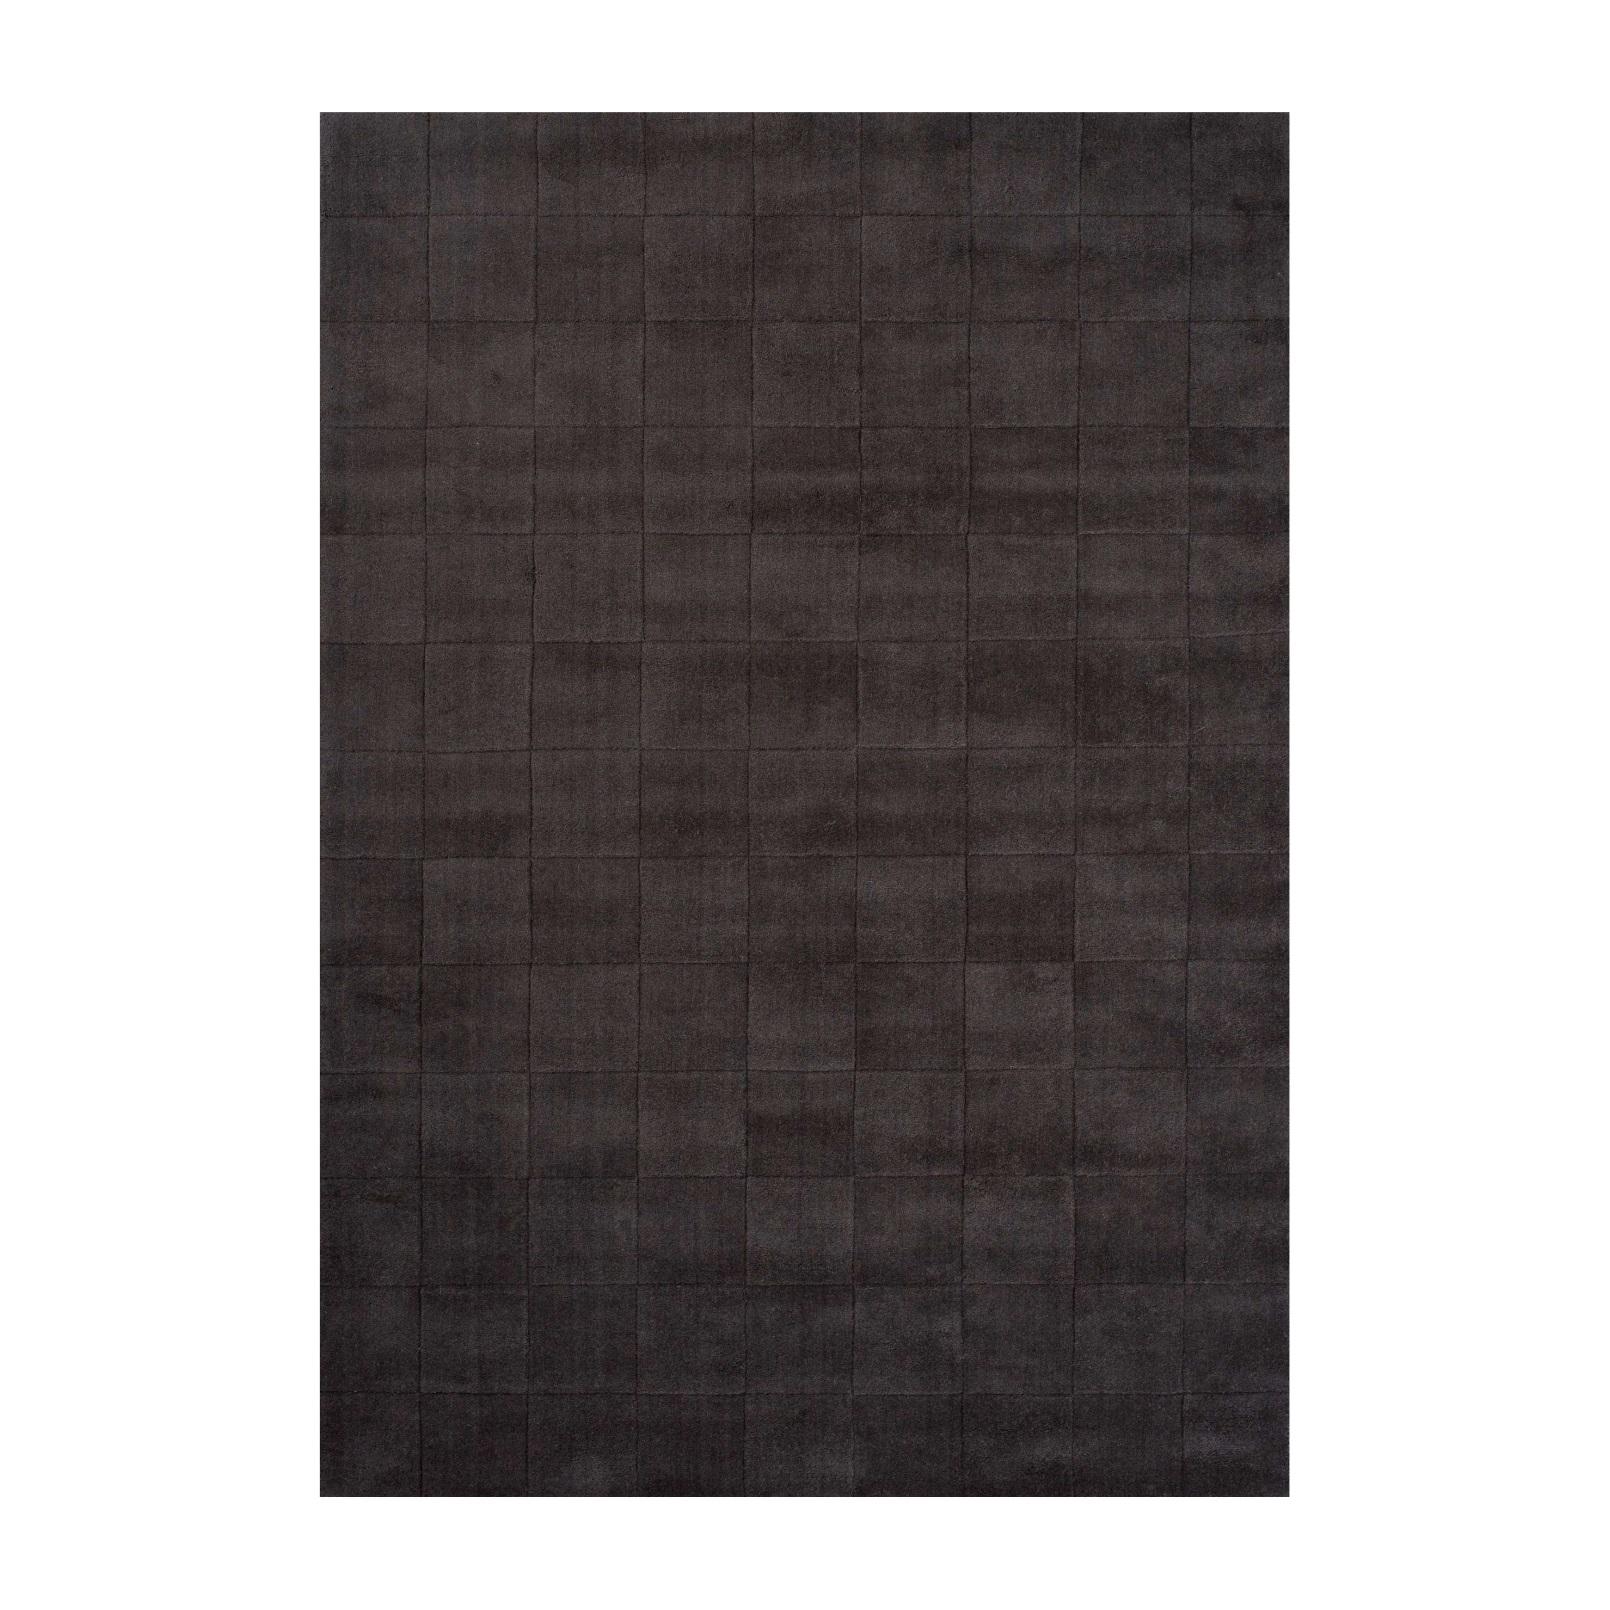 Ullmatta LUZERN 140 x 200 cm mellangrå, Linie Design